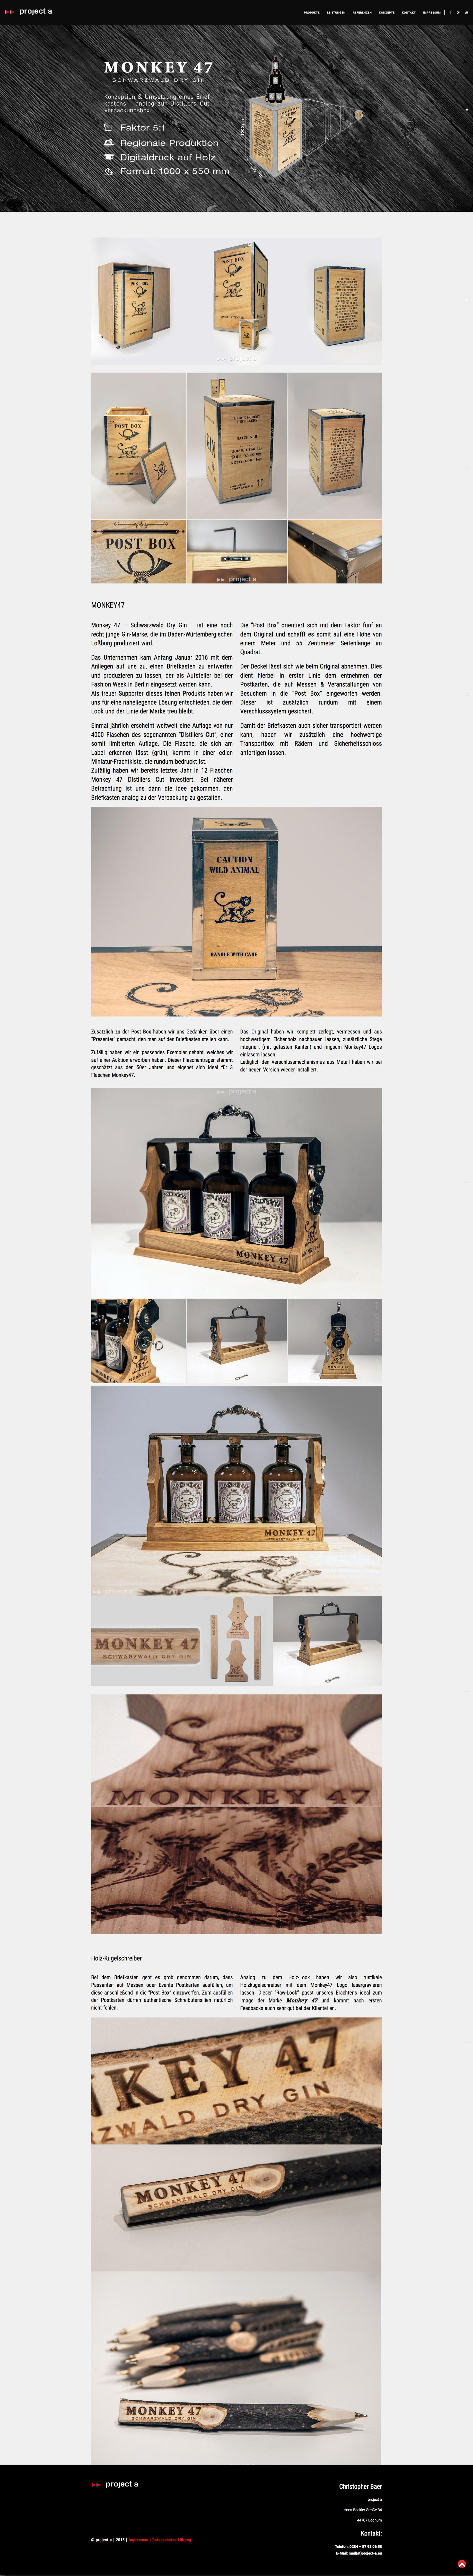 monkey47, dokumentation, fotografie, landing page design, gestaltung, webdesign, bildbearbeitung